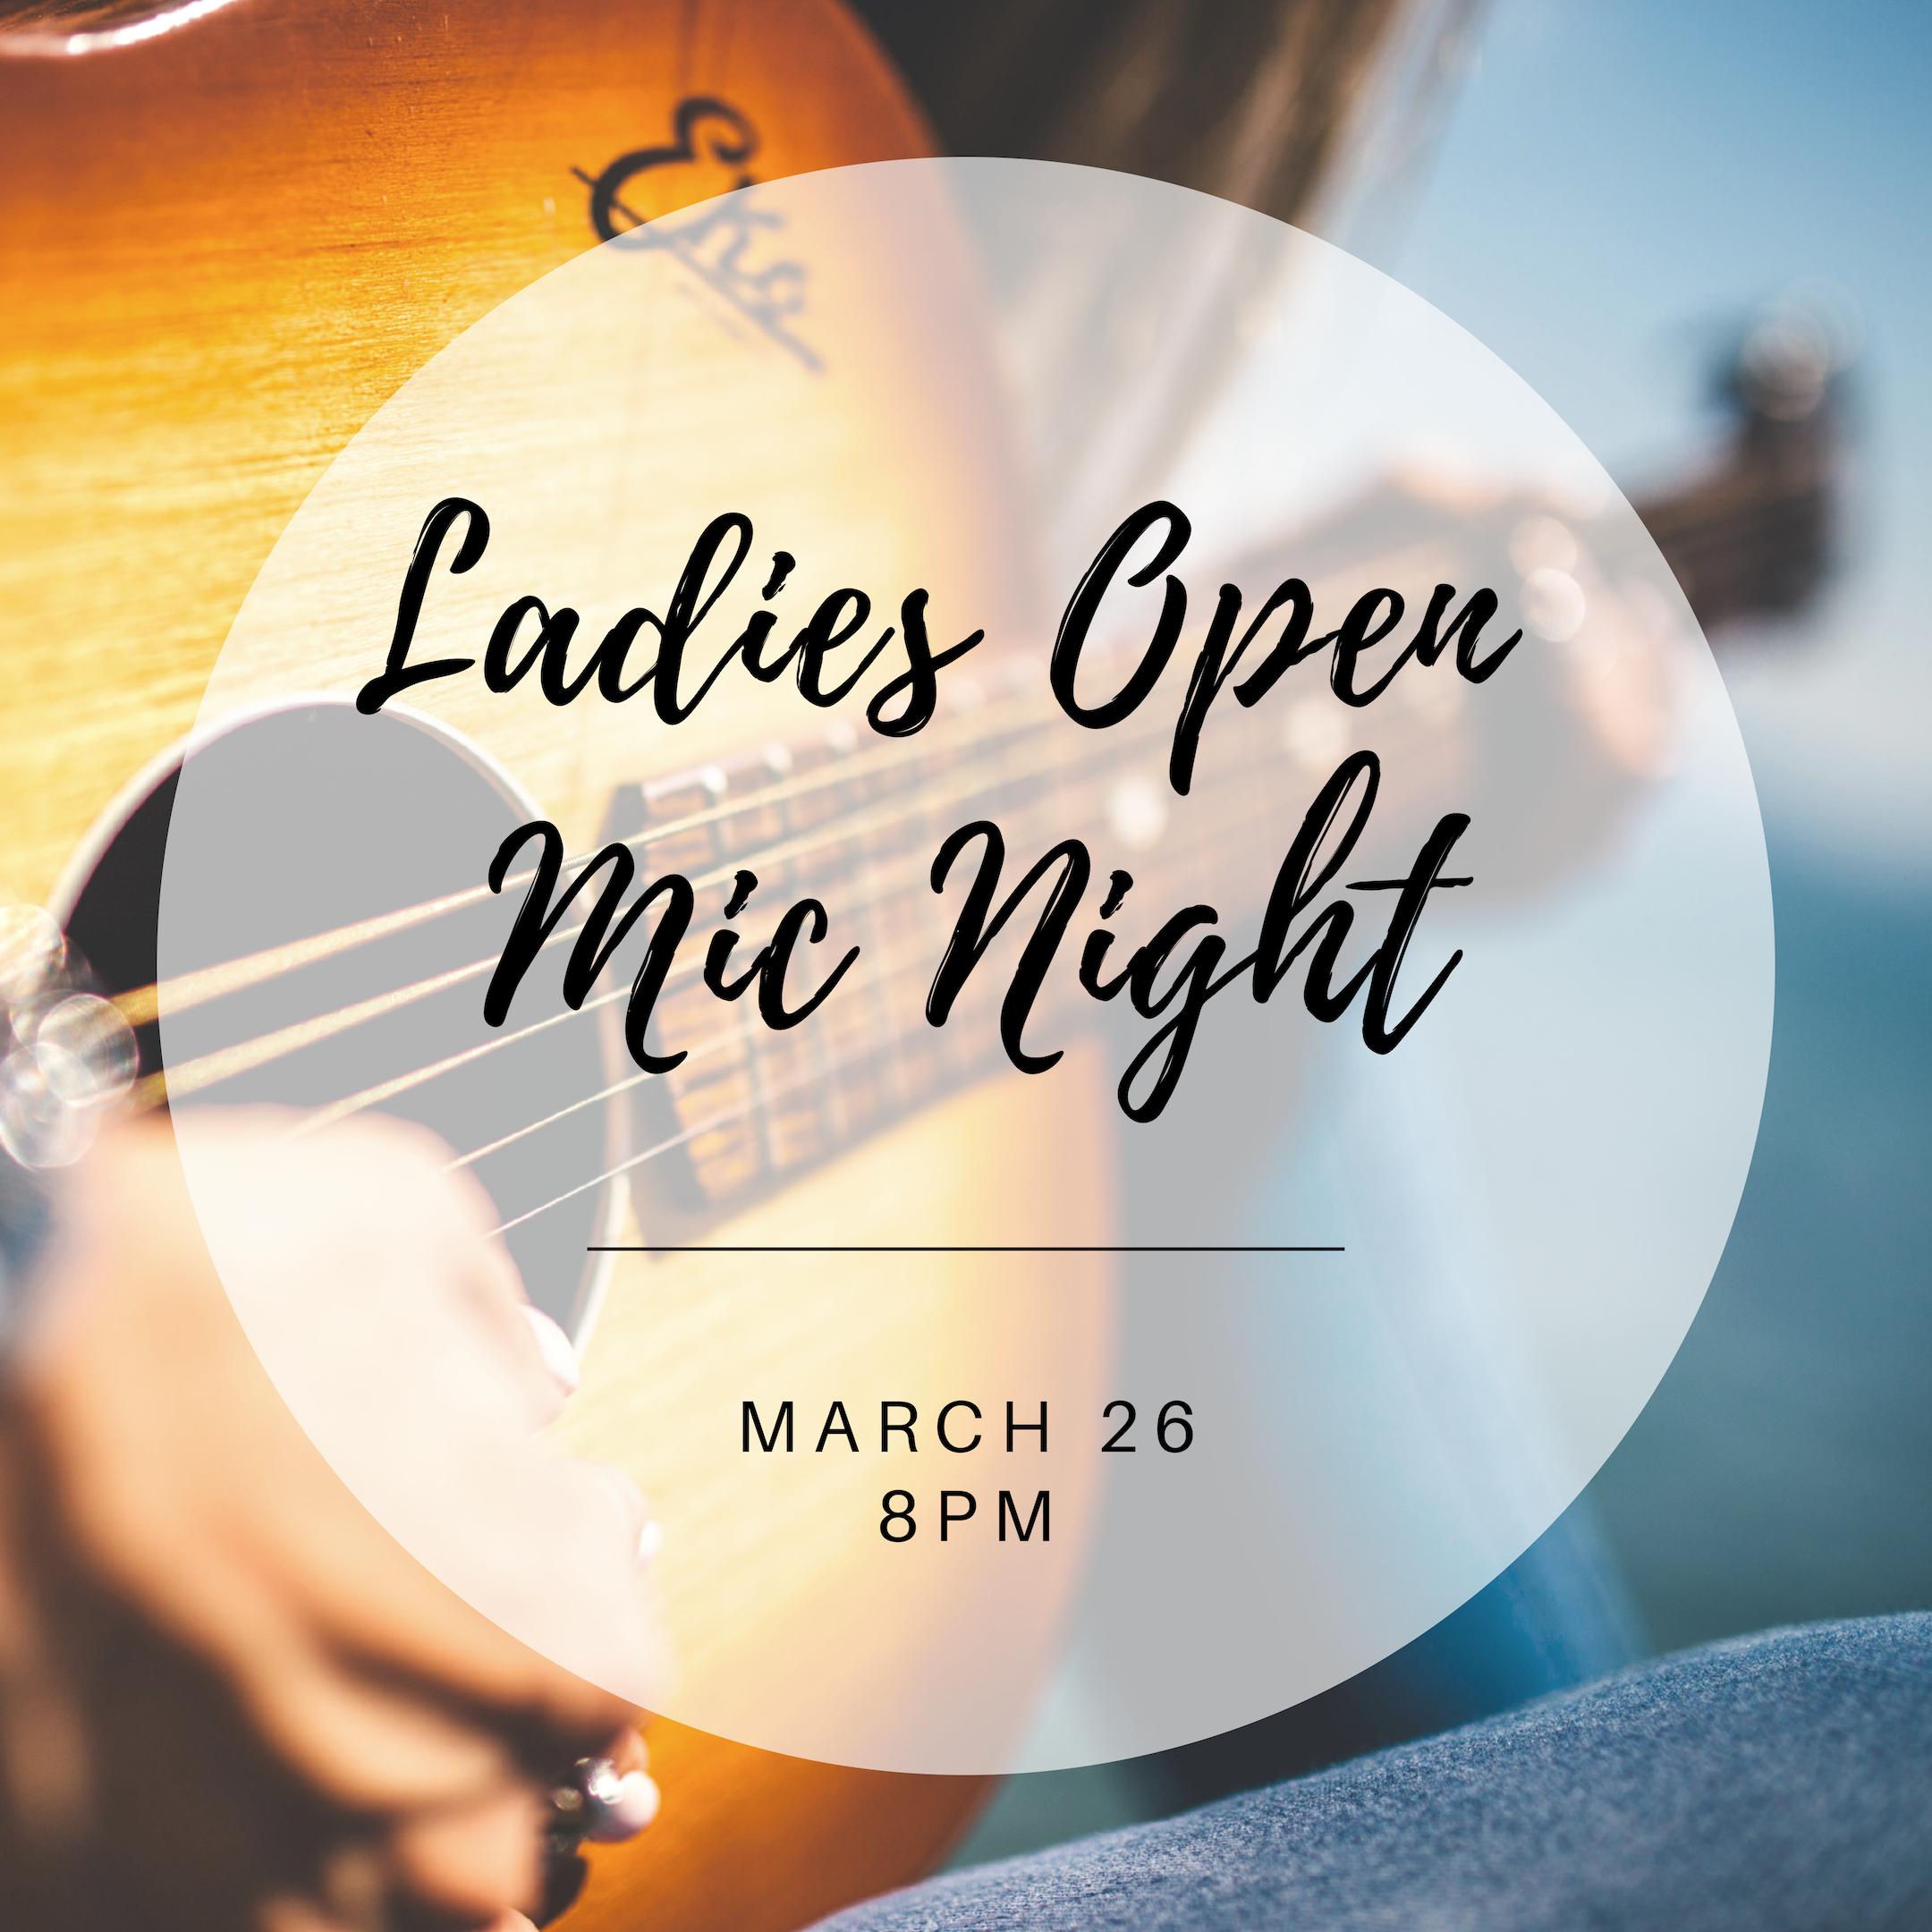 Ladies Open Mic Night.png